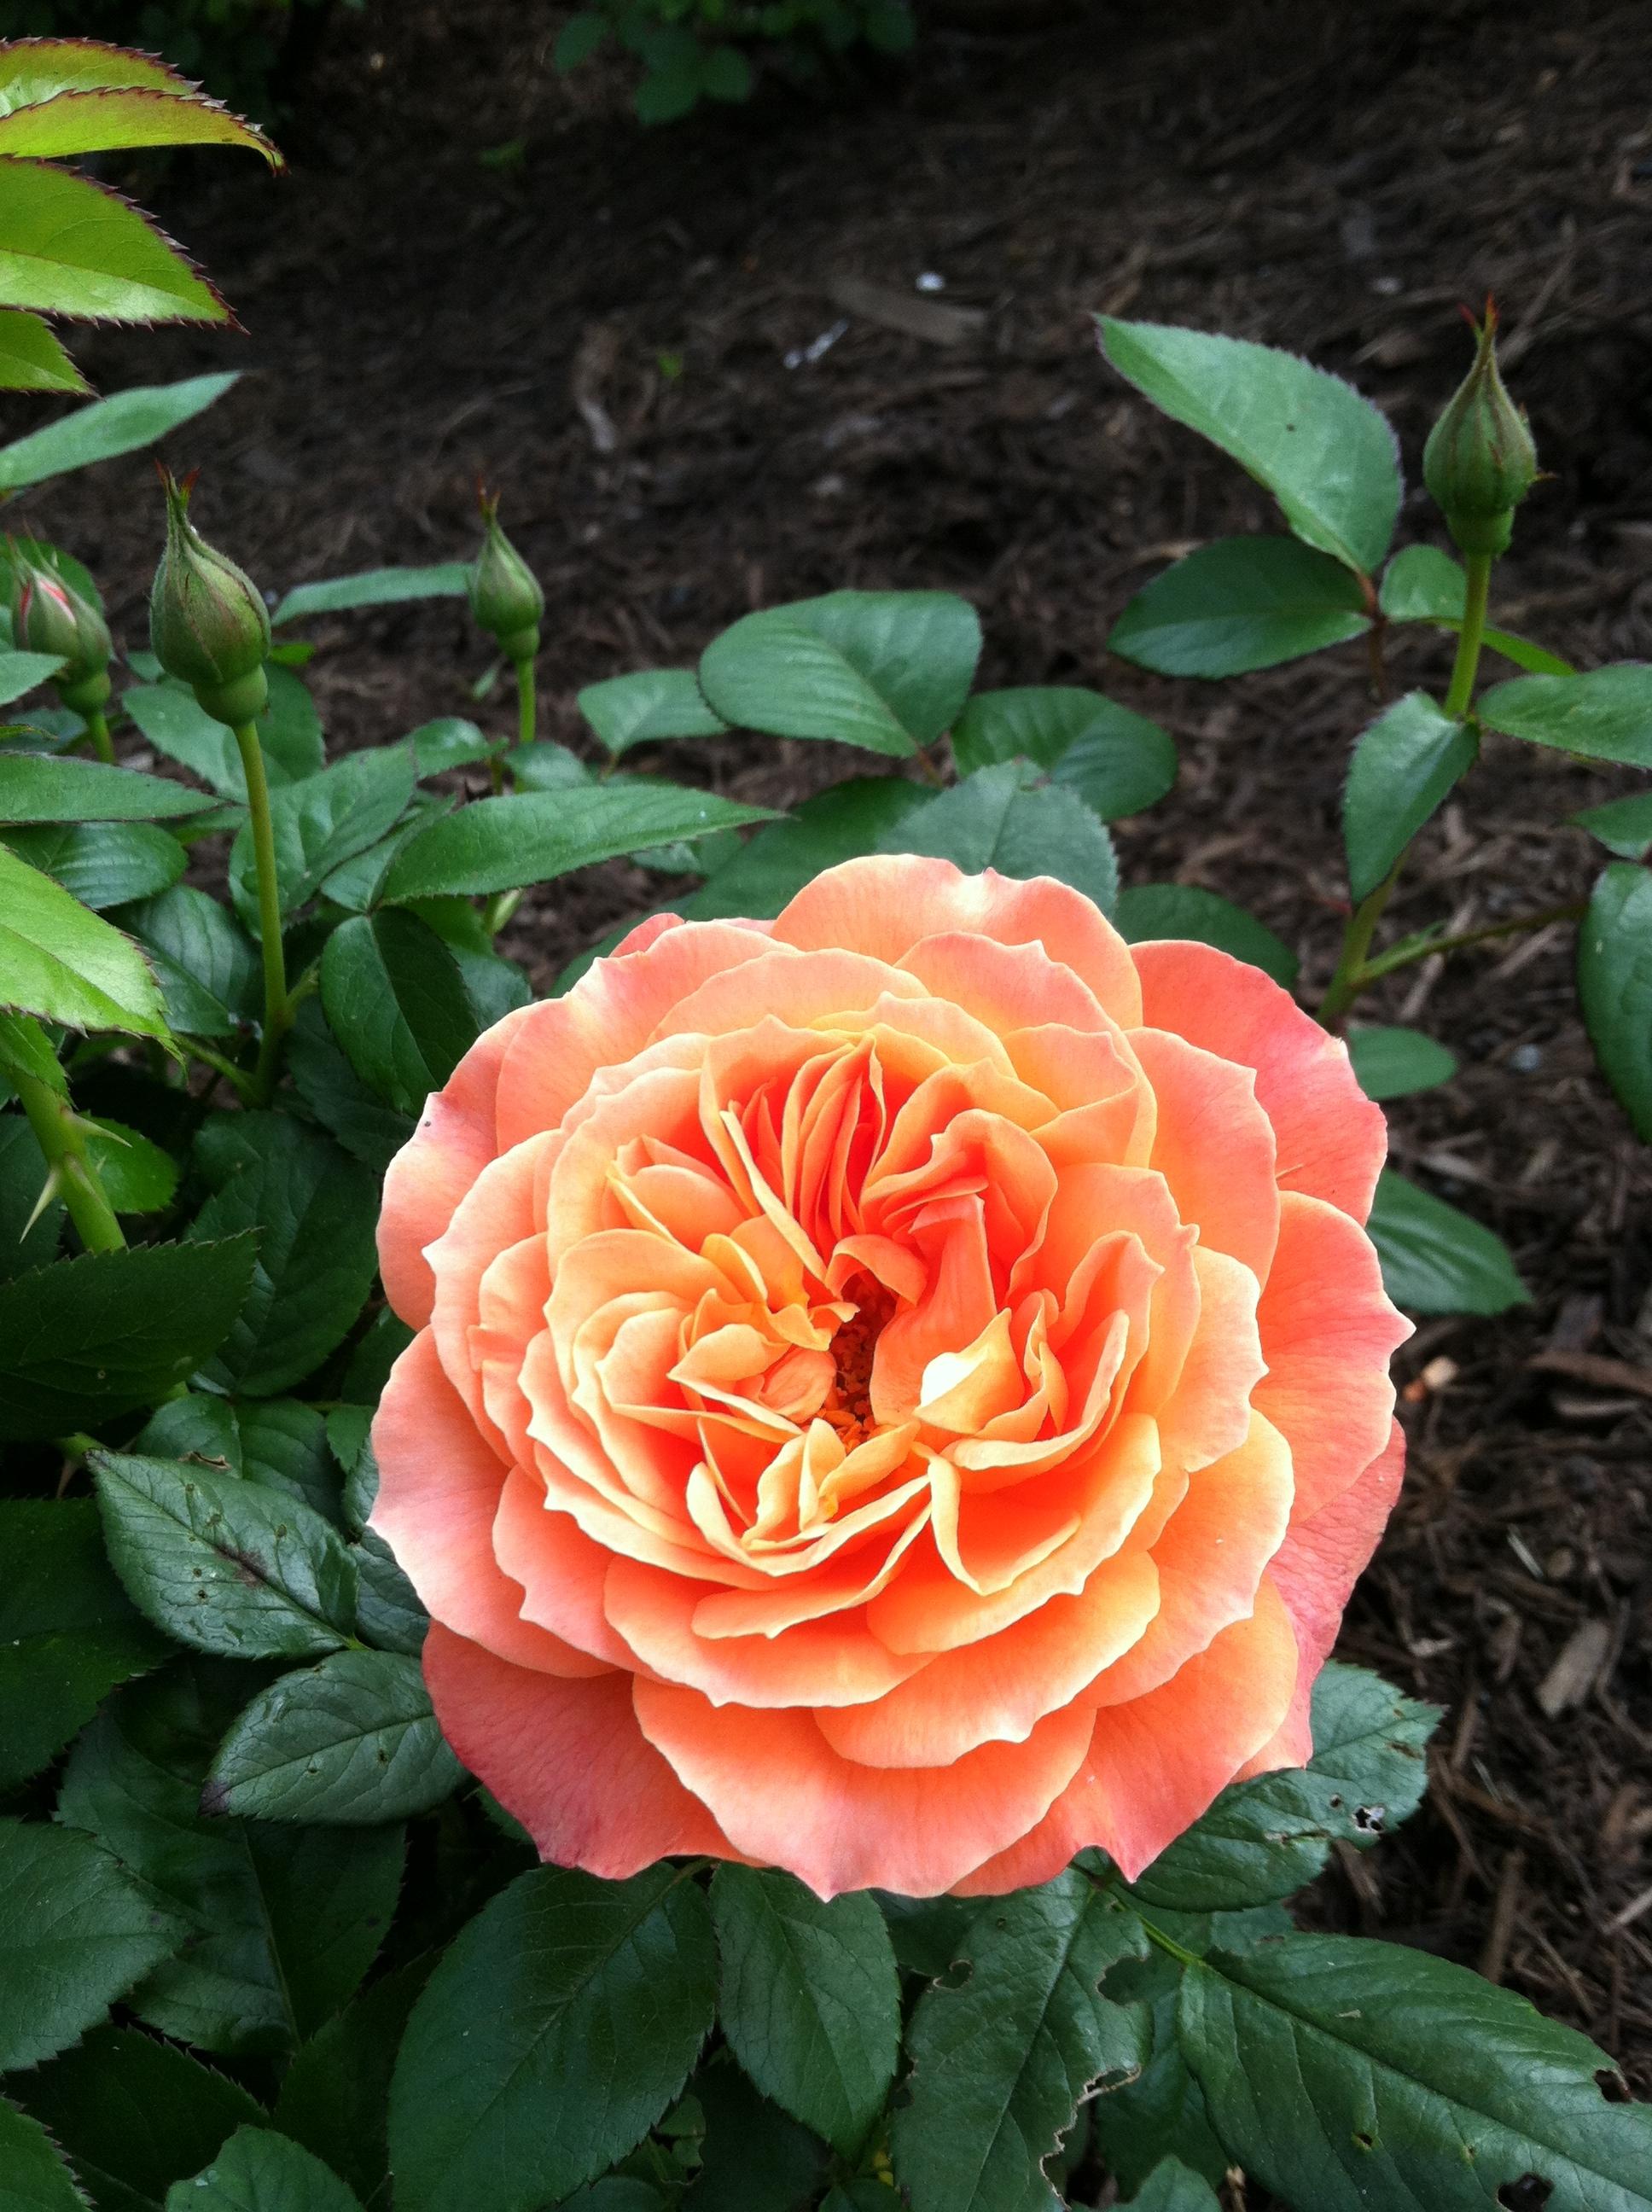 Simple Rose Garden: 'Livin' Easy' In The Rose Garden This Spring